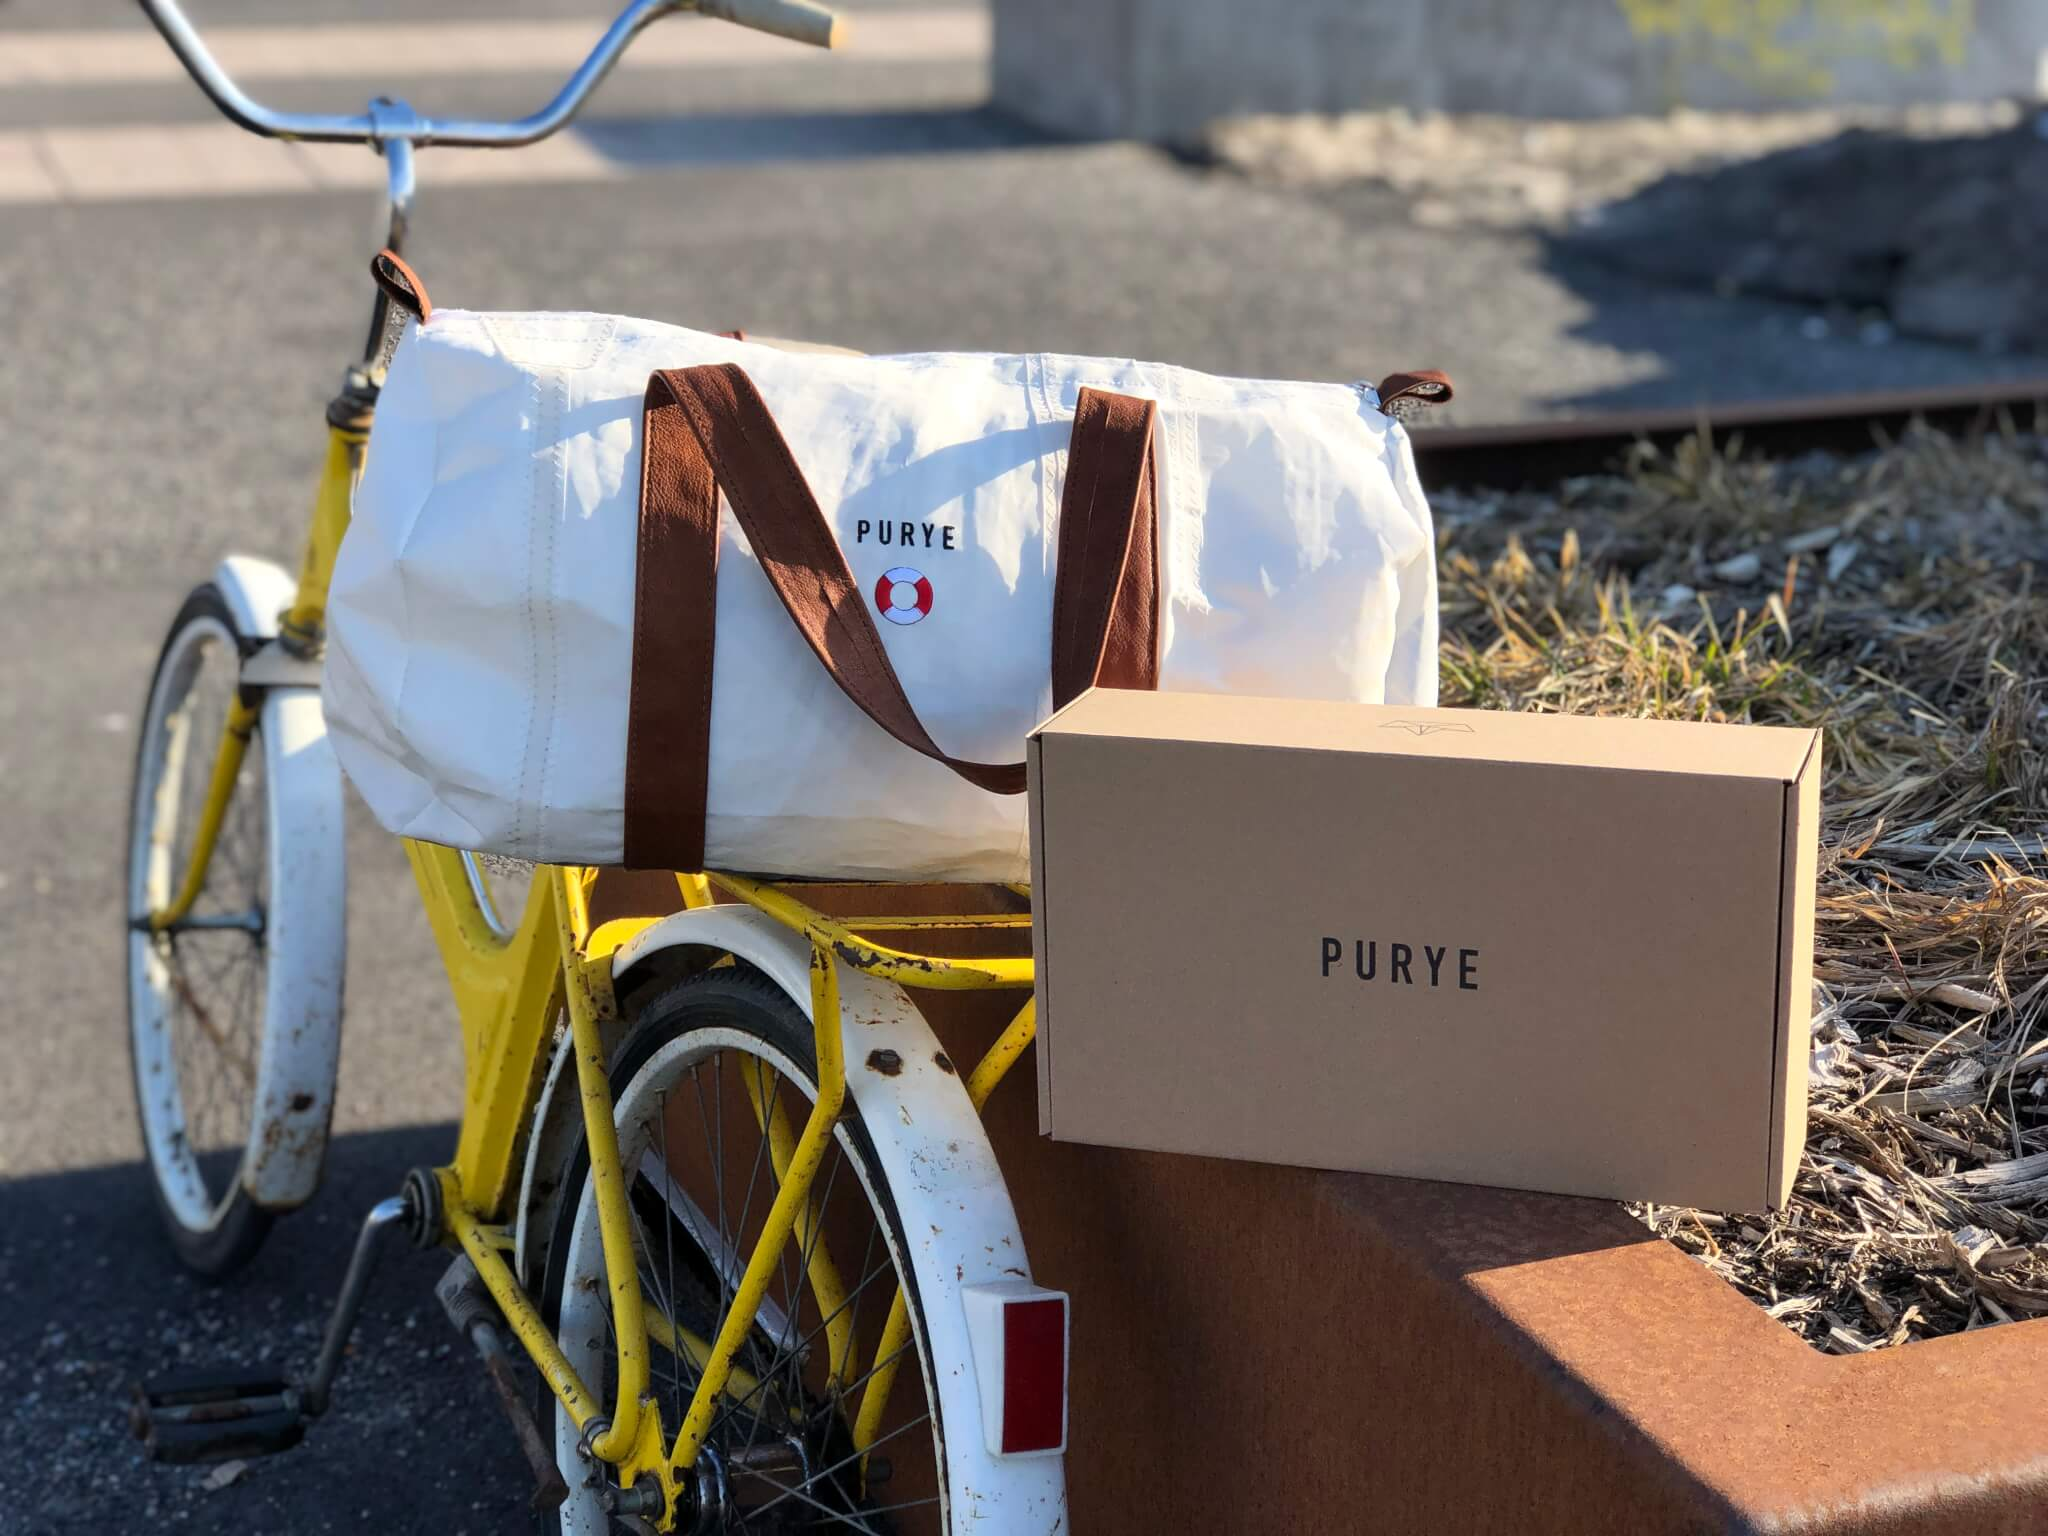 L'emballage de Purye Clothing